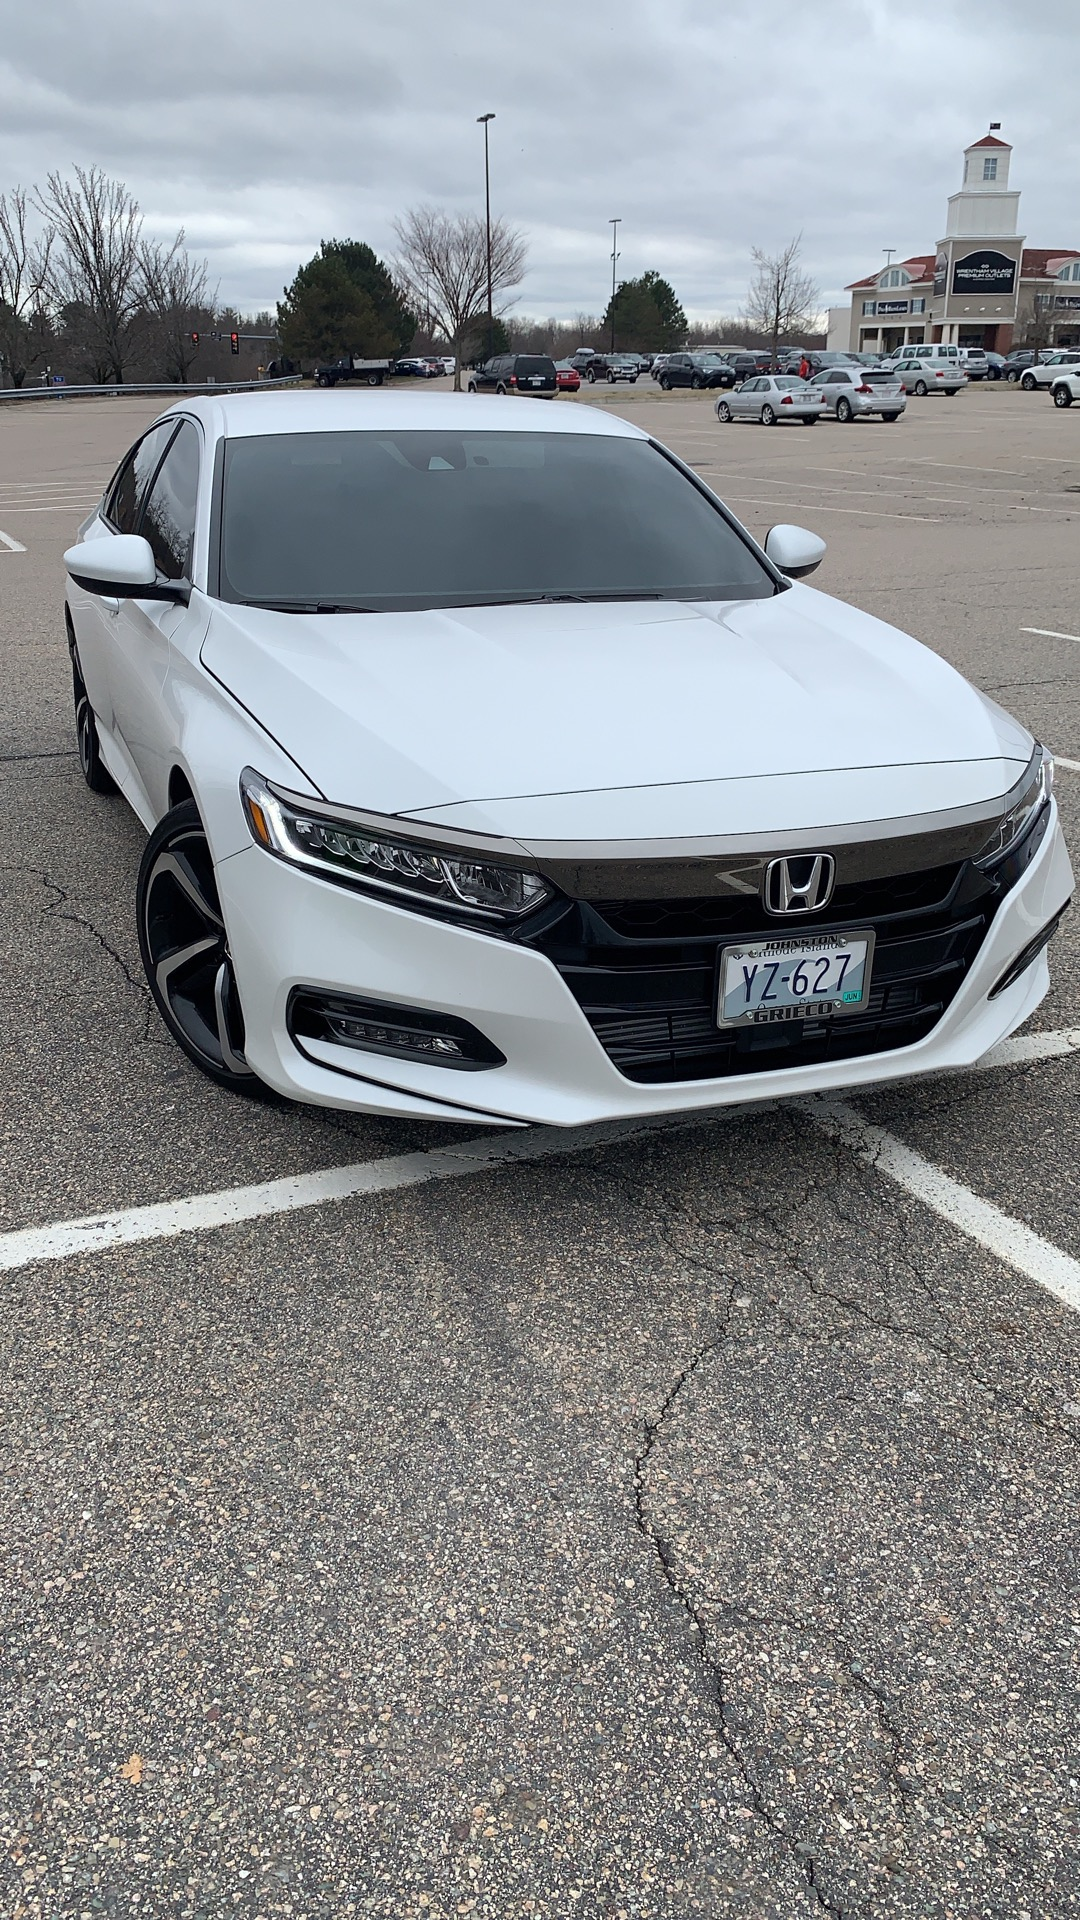 2018 Honda Accord - photo 1